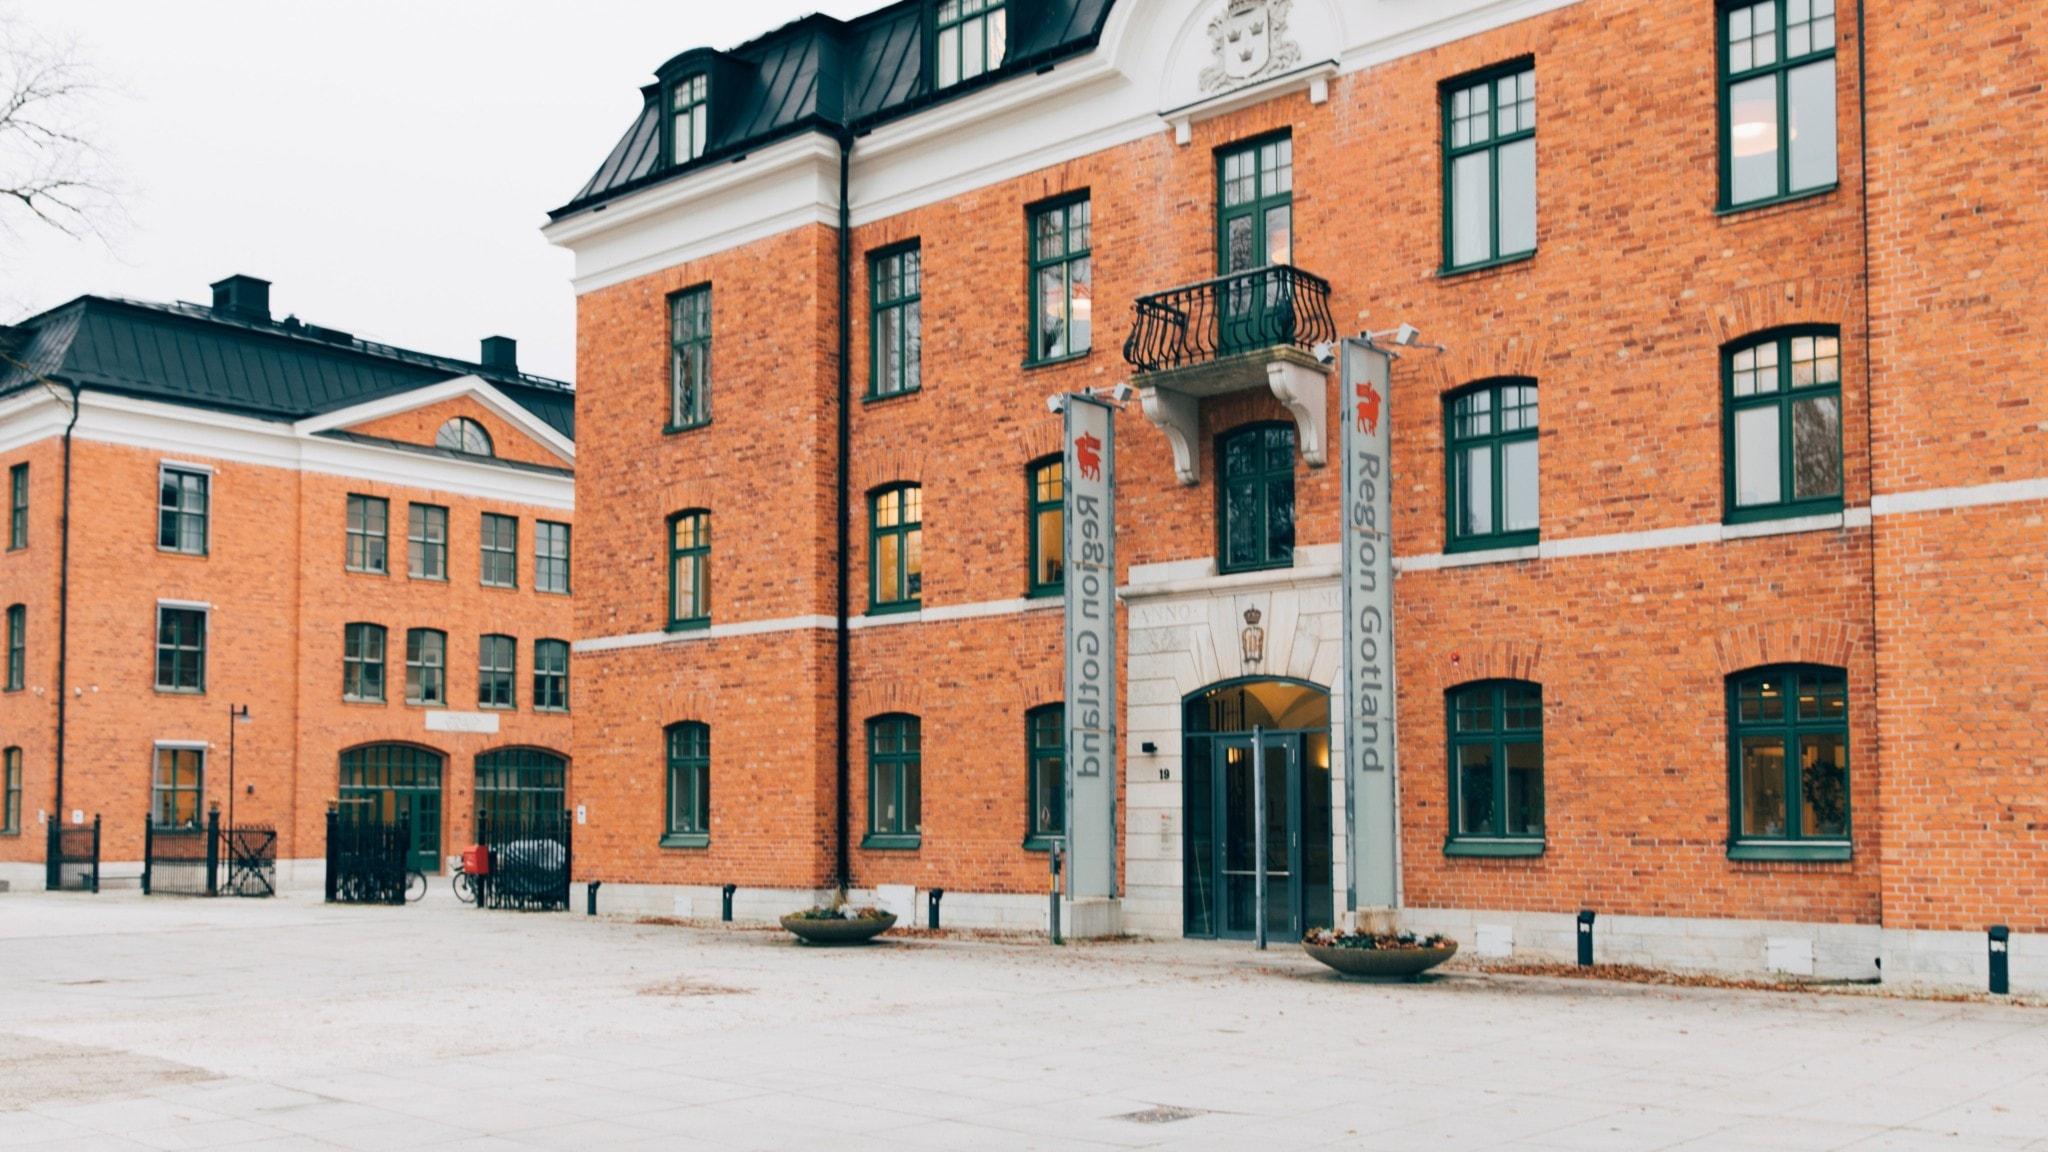 Sommarvikariat - Kvinna p Gotland sker personlig assistent